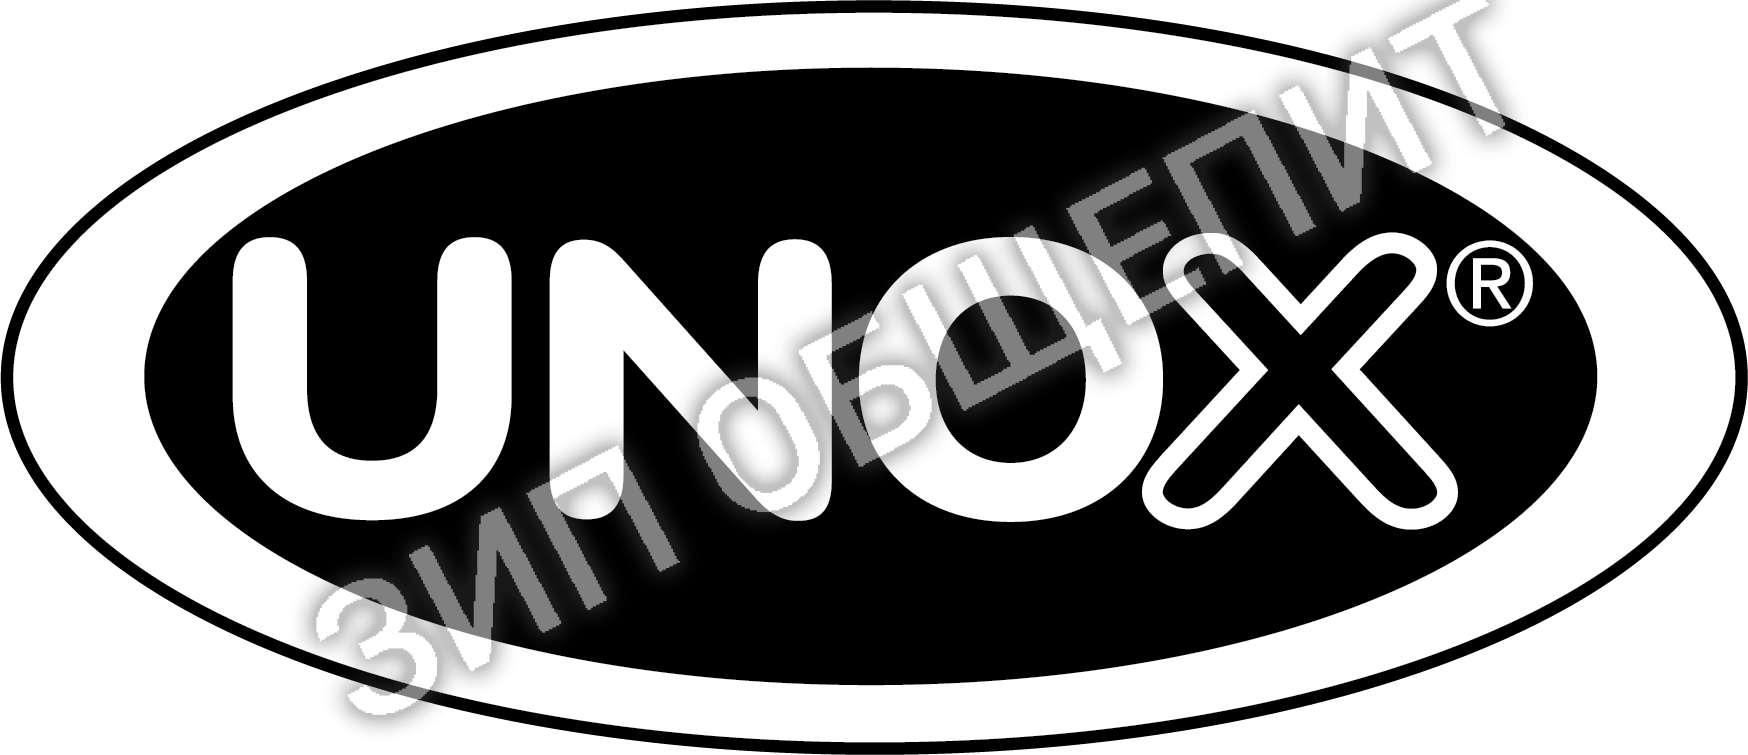 Втулка VM1630A0 для пароконвектомата UNOX модели XEVC-0511-E1R